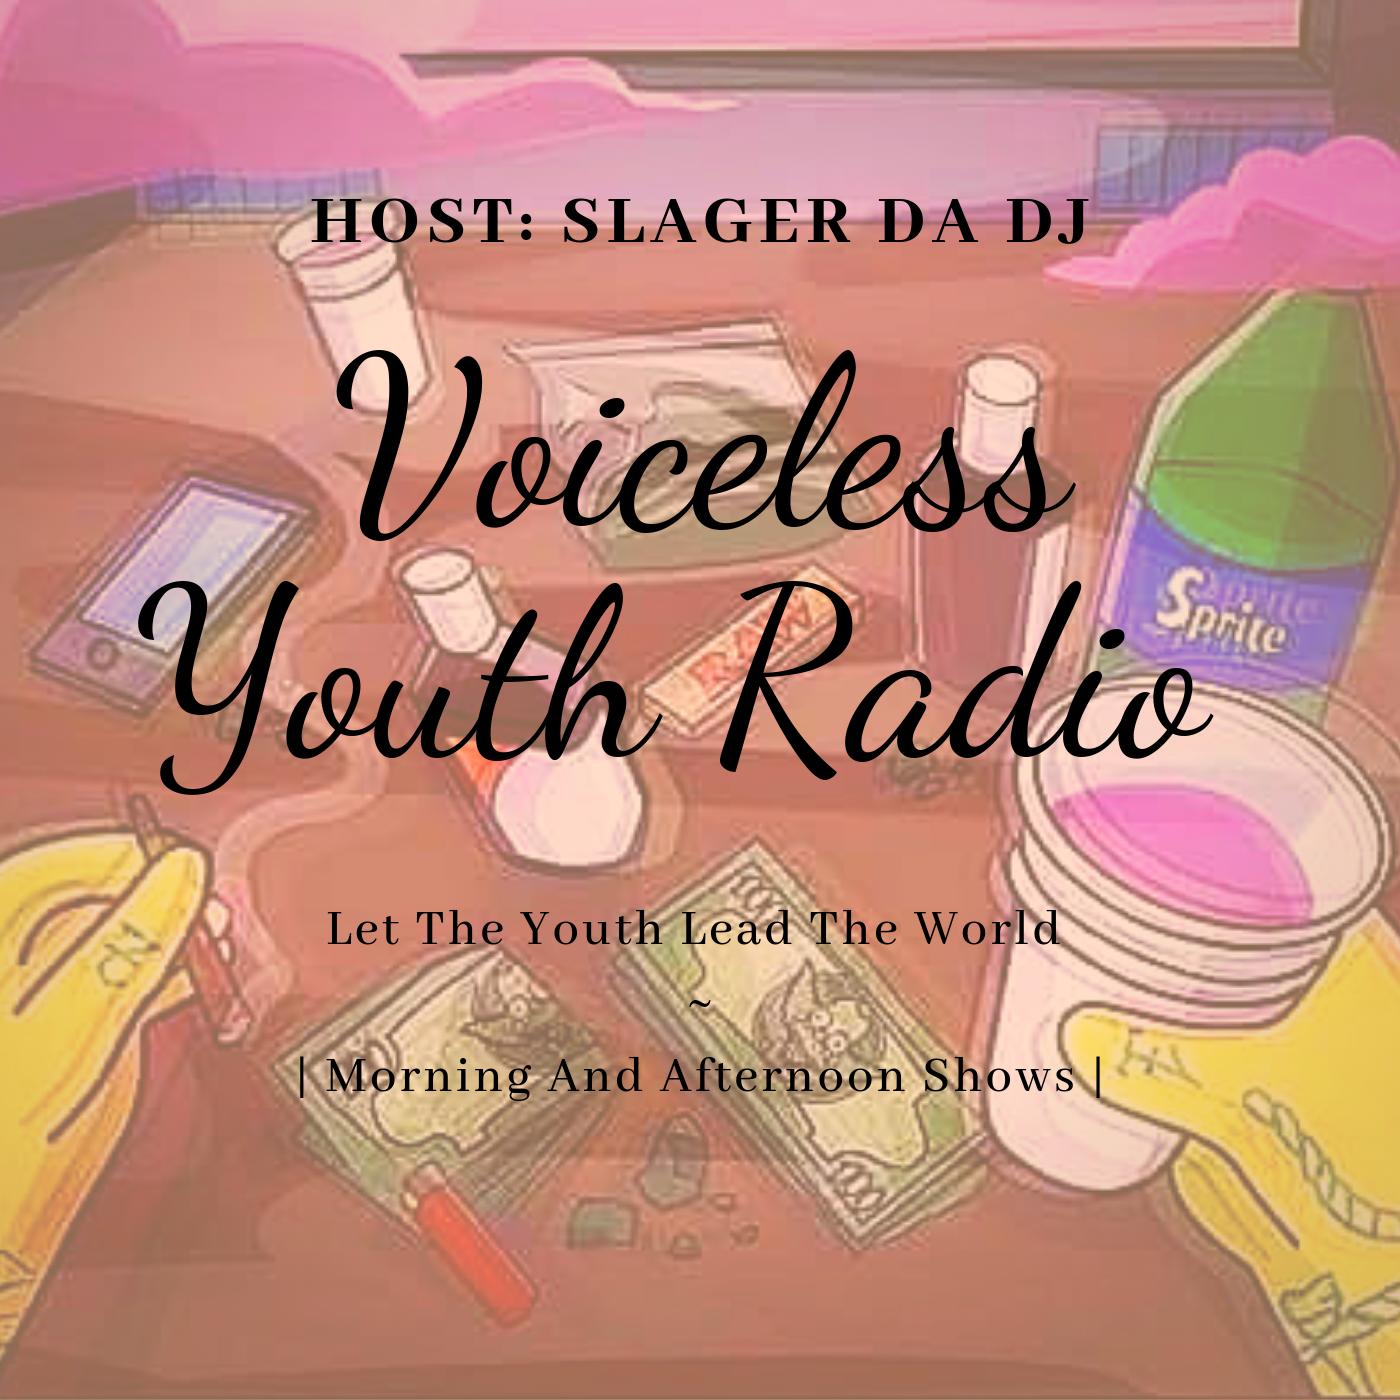 Voiceless Youth Radio